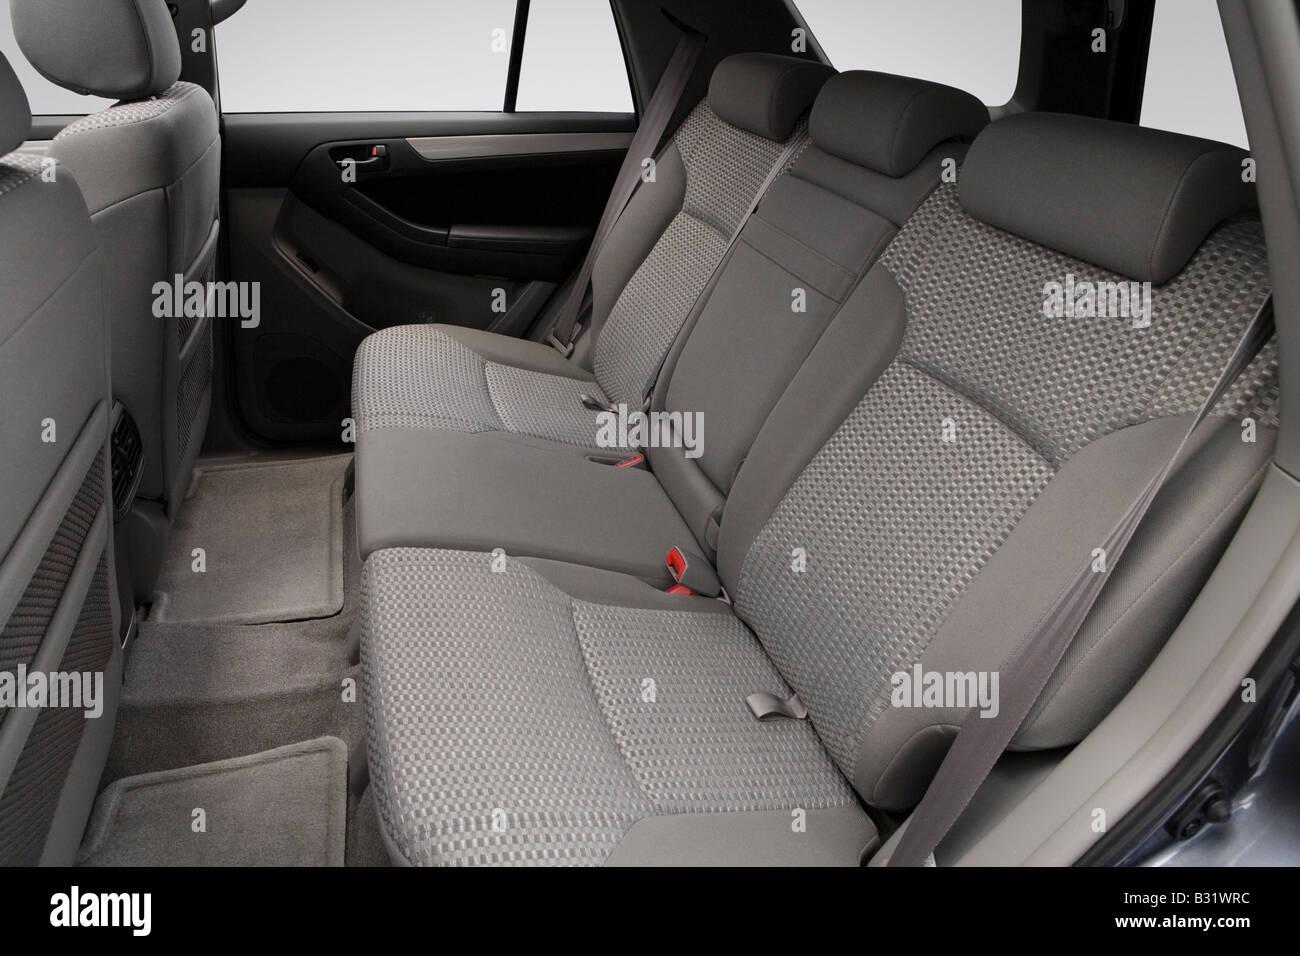 2008 Toyota 4runner Sr5 In Gray Rear Seats Stock Photo Alamy